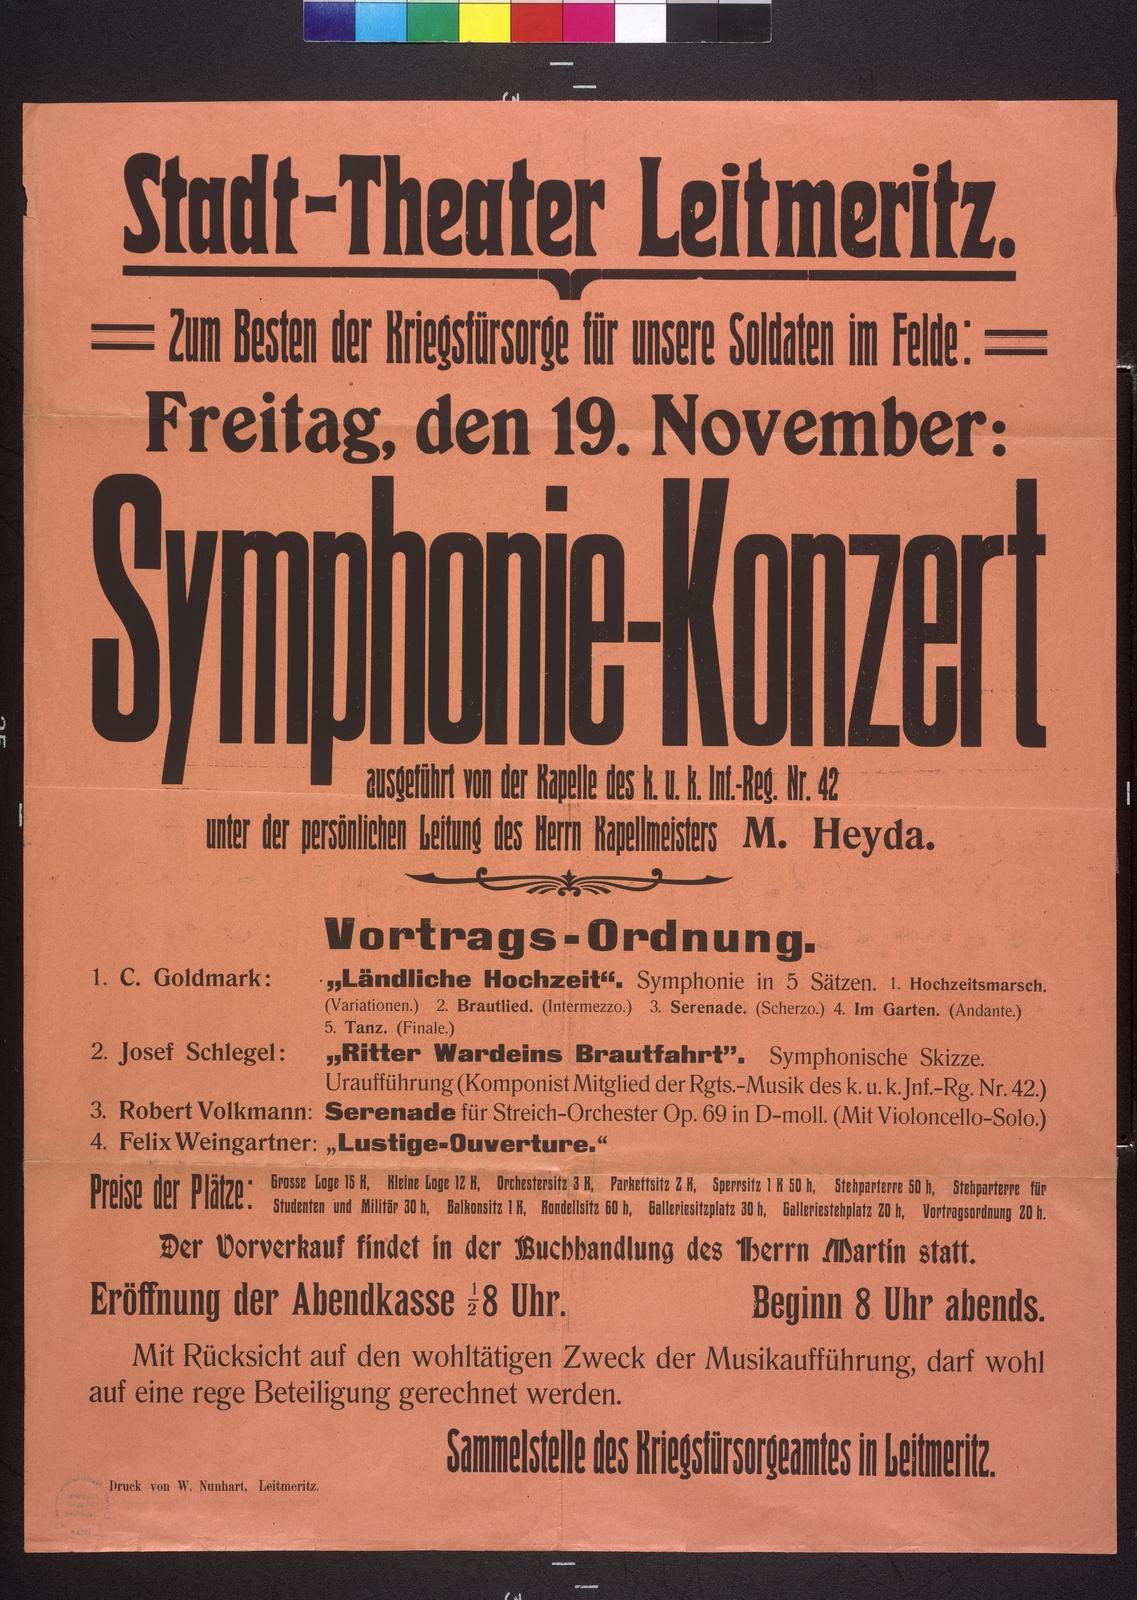 Symphoniekonzert - Kriegsfürsorge - Textplakat - Leitmeritz